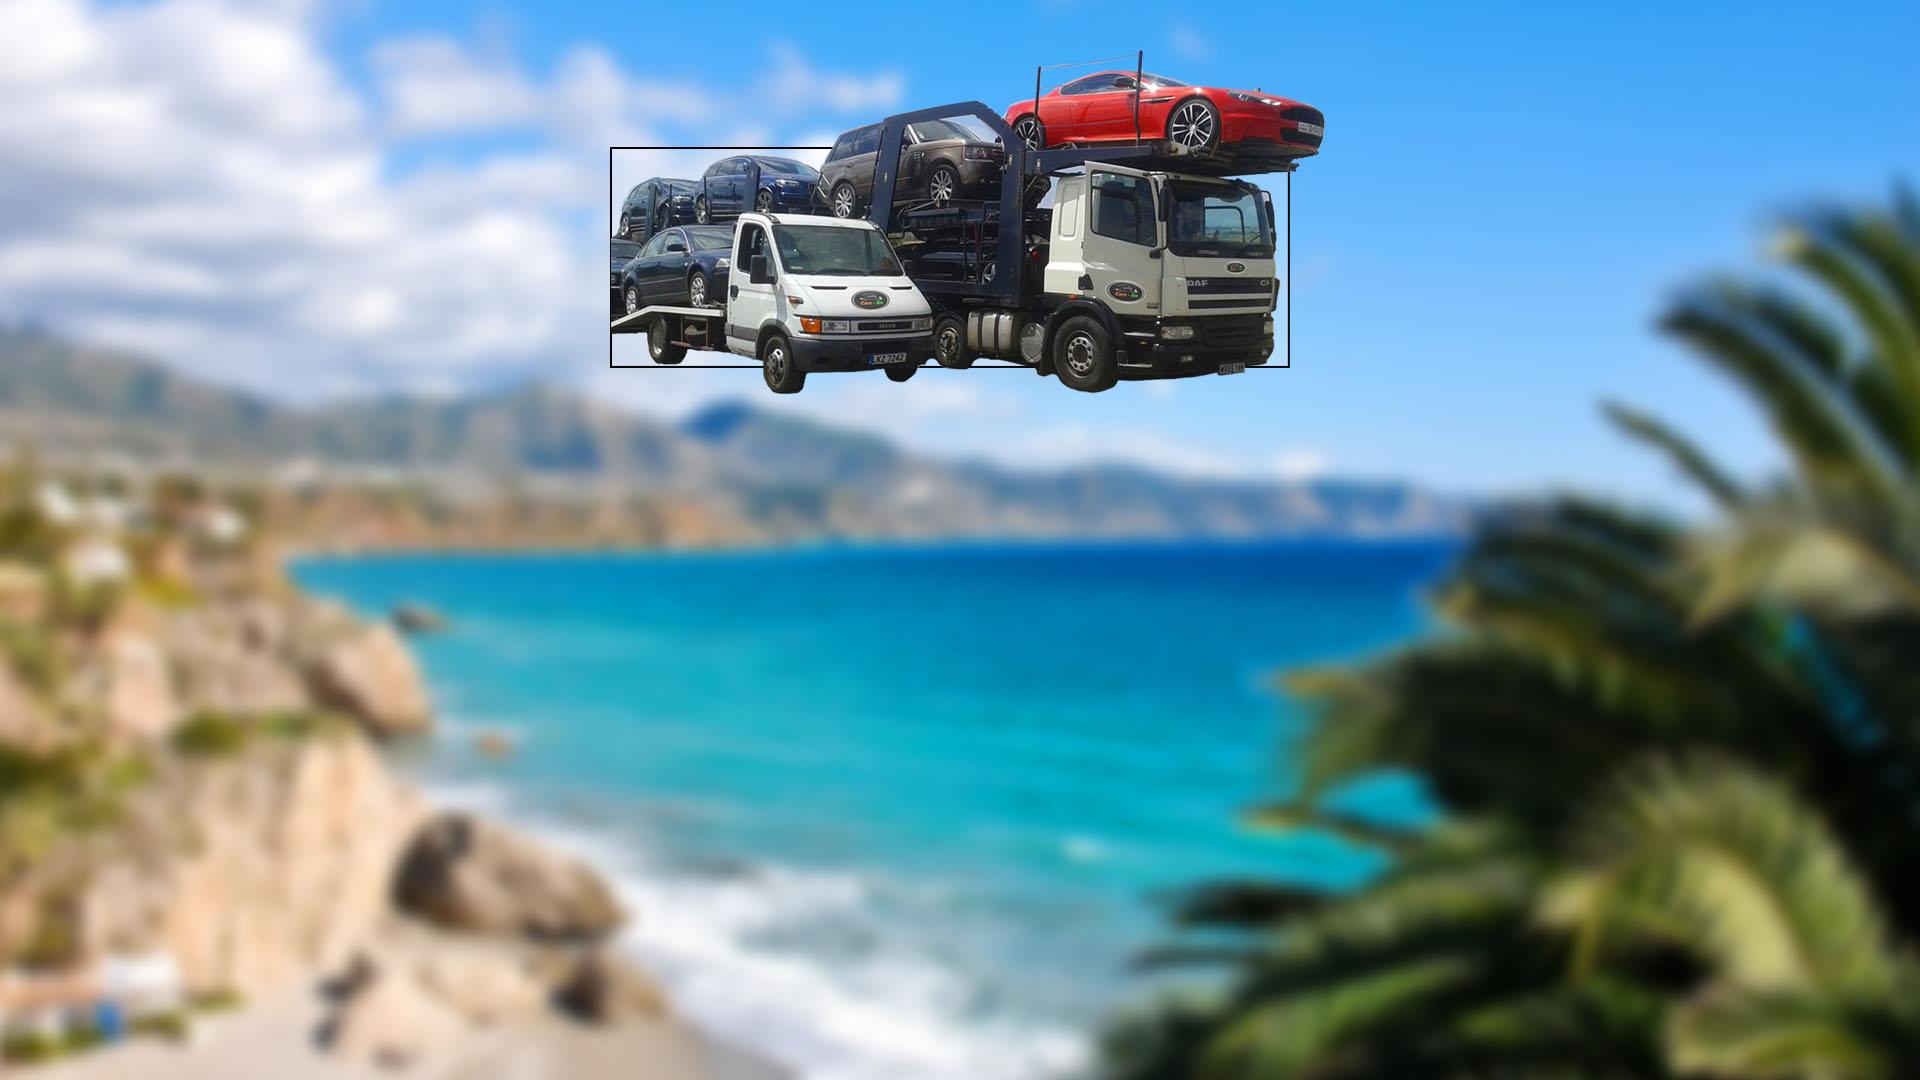 Cars-Go-Transport Car Transport, England, Ireland, Spain, Portugal 3